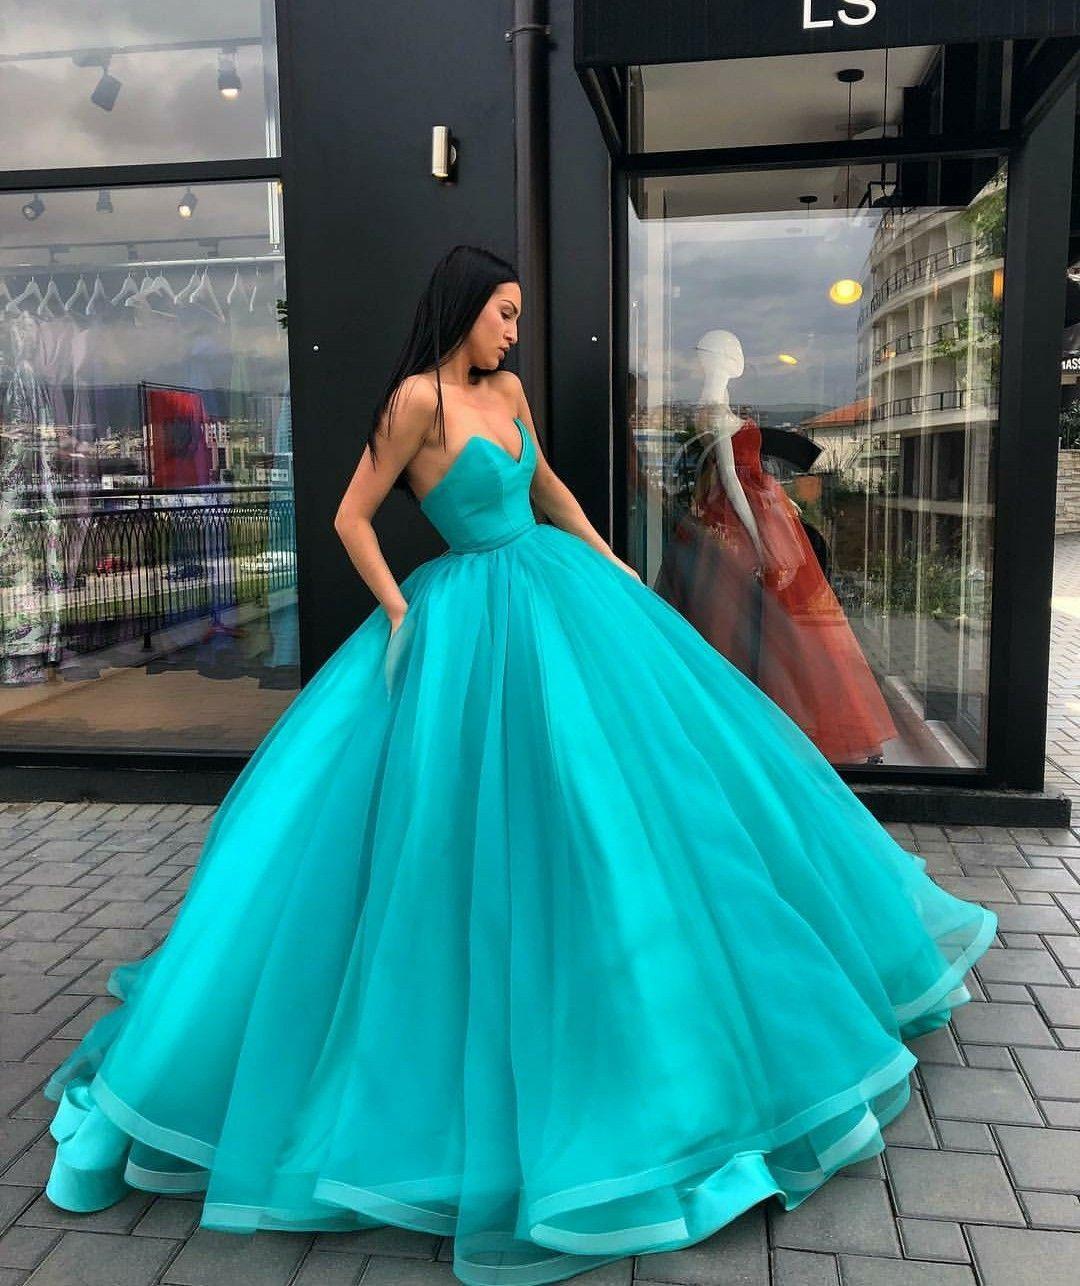 Abend Cool Abendkleid Extravagant VertriebFormal Top Abendkleid Extravagant Boutique